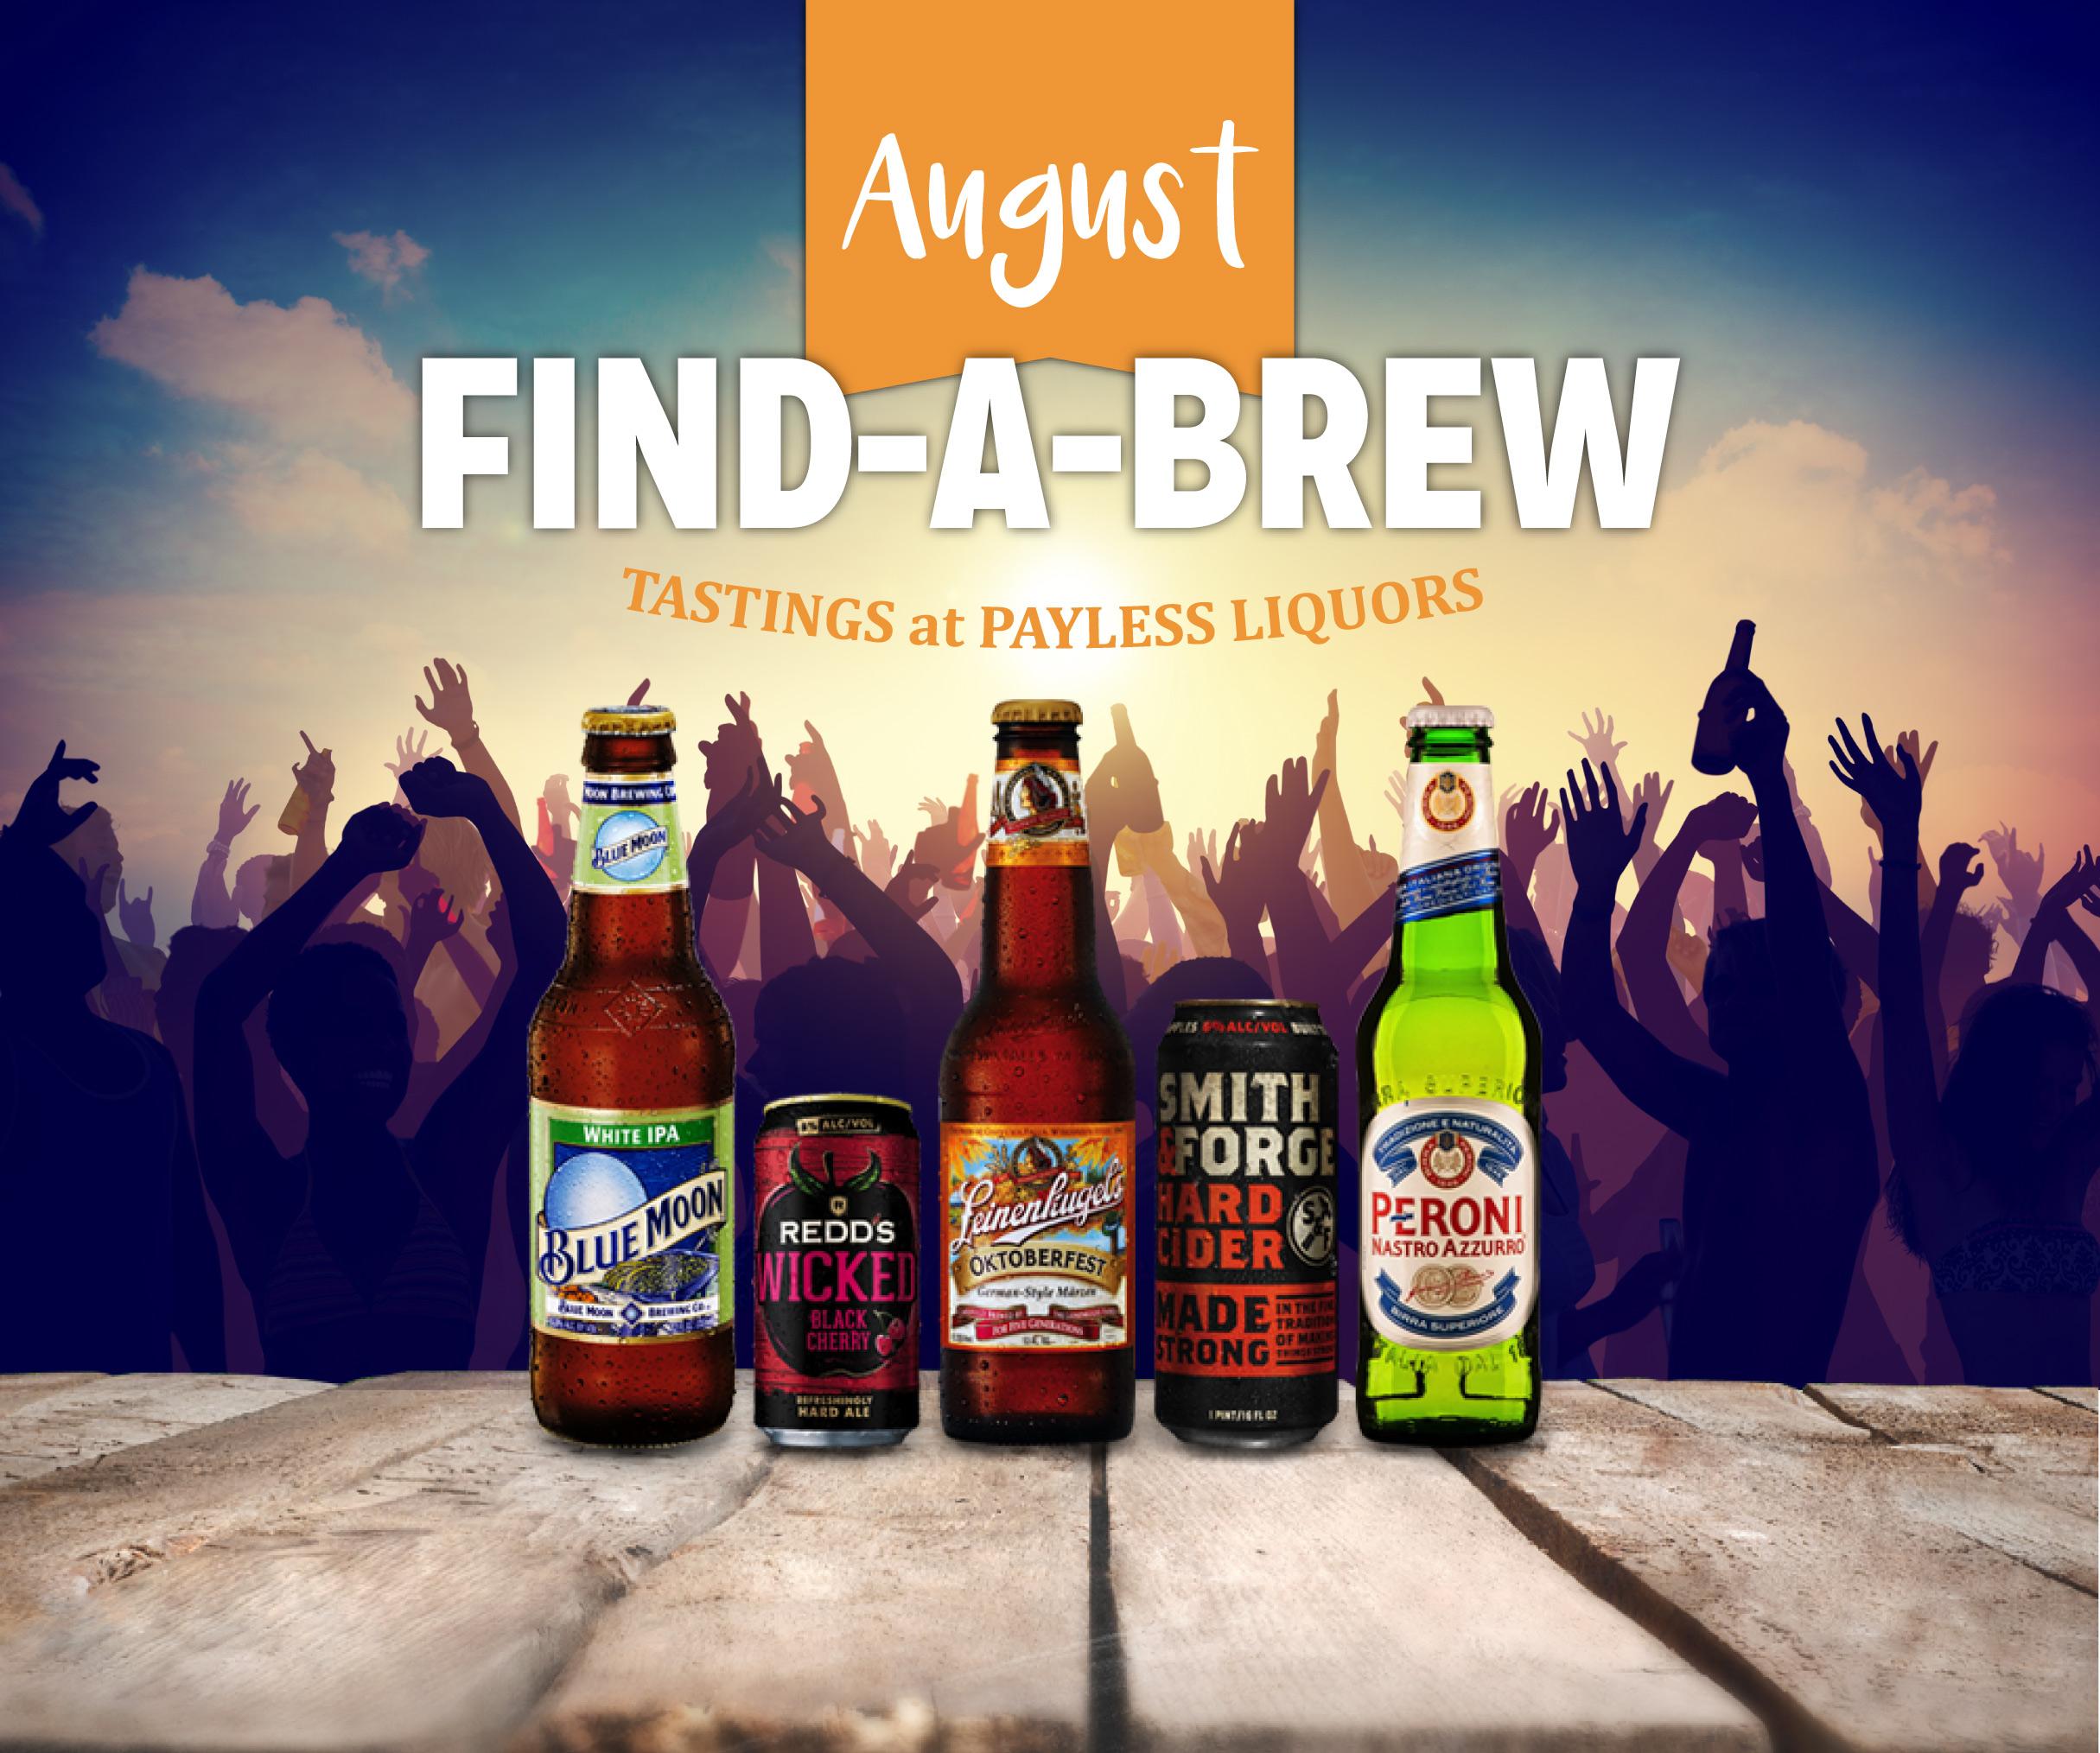 PL-August_Find_A_Brew_2015